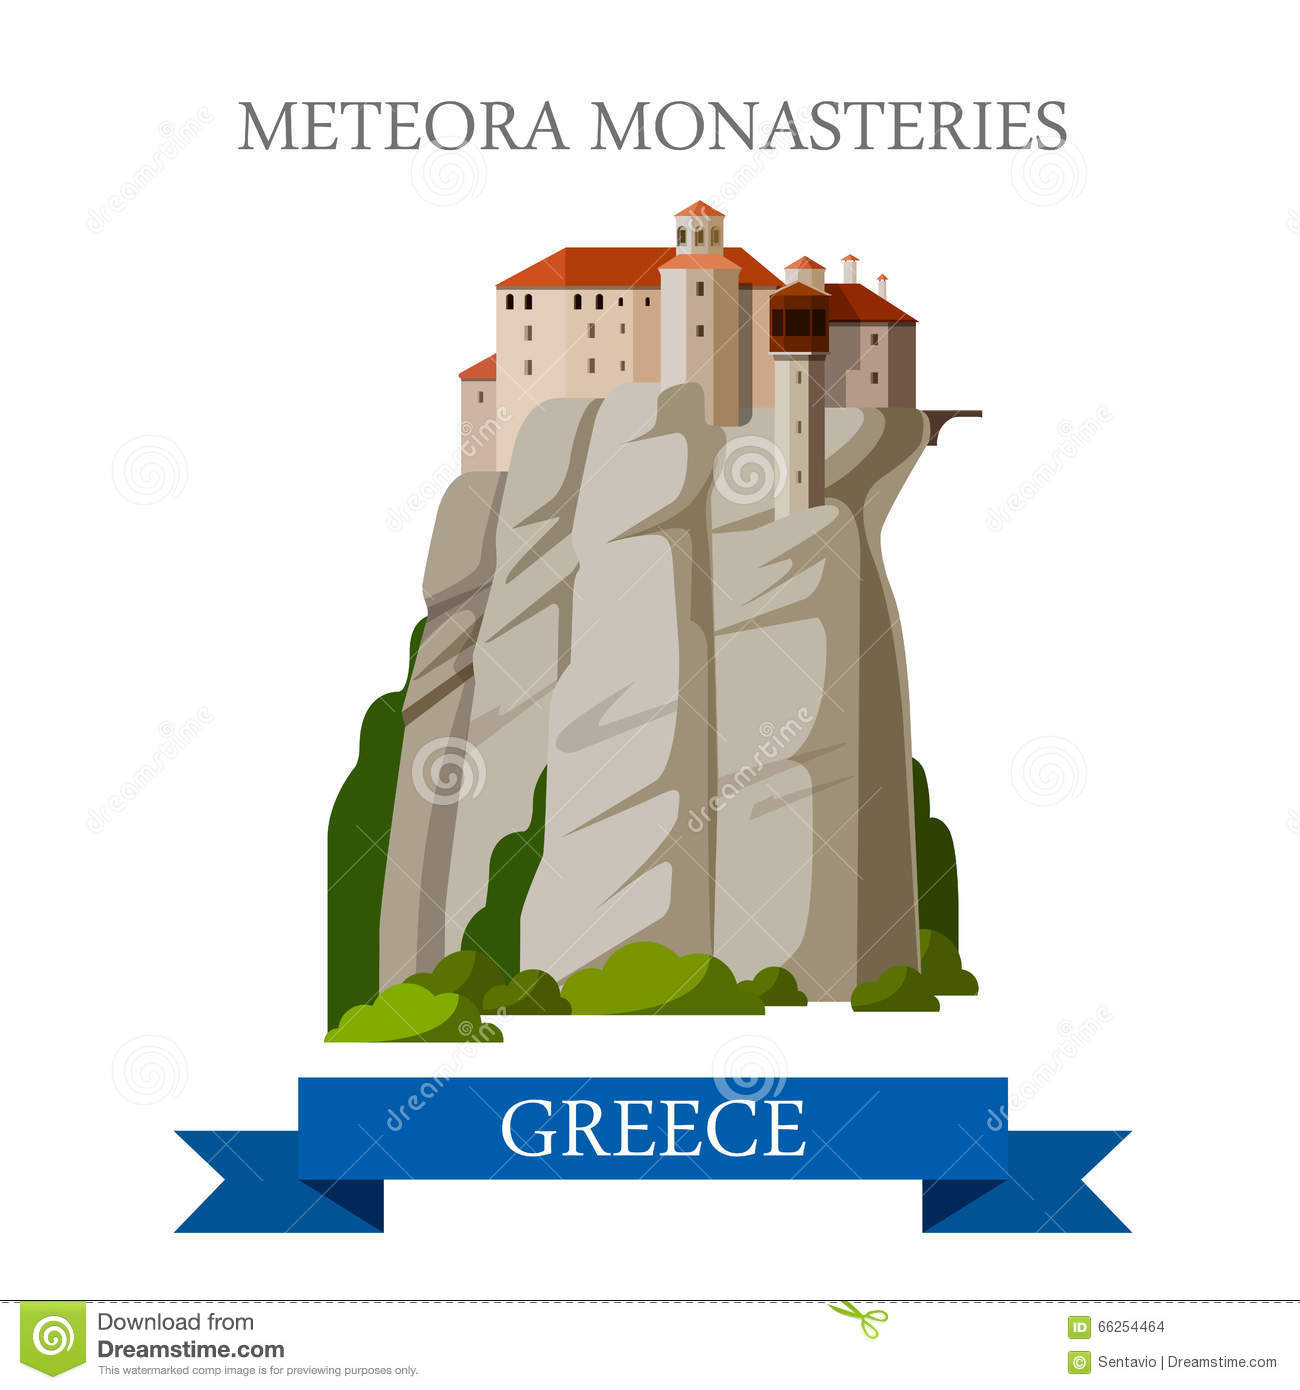 Greek Orthodox Monasteries In Meteora Greece Stock Photo.